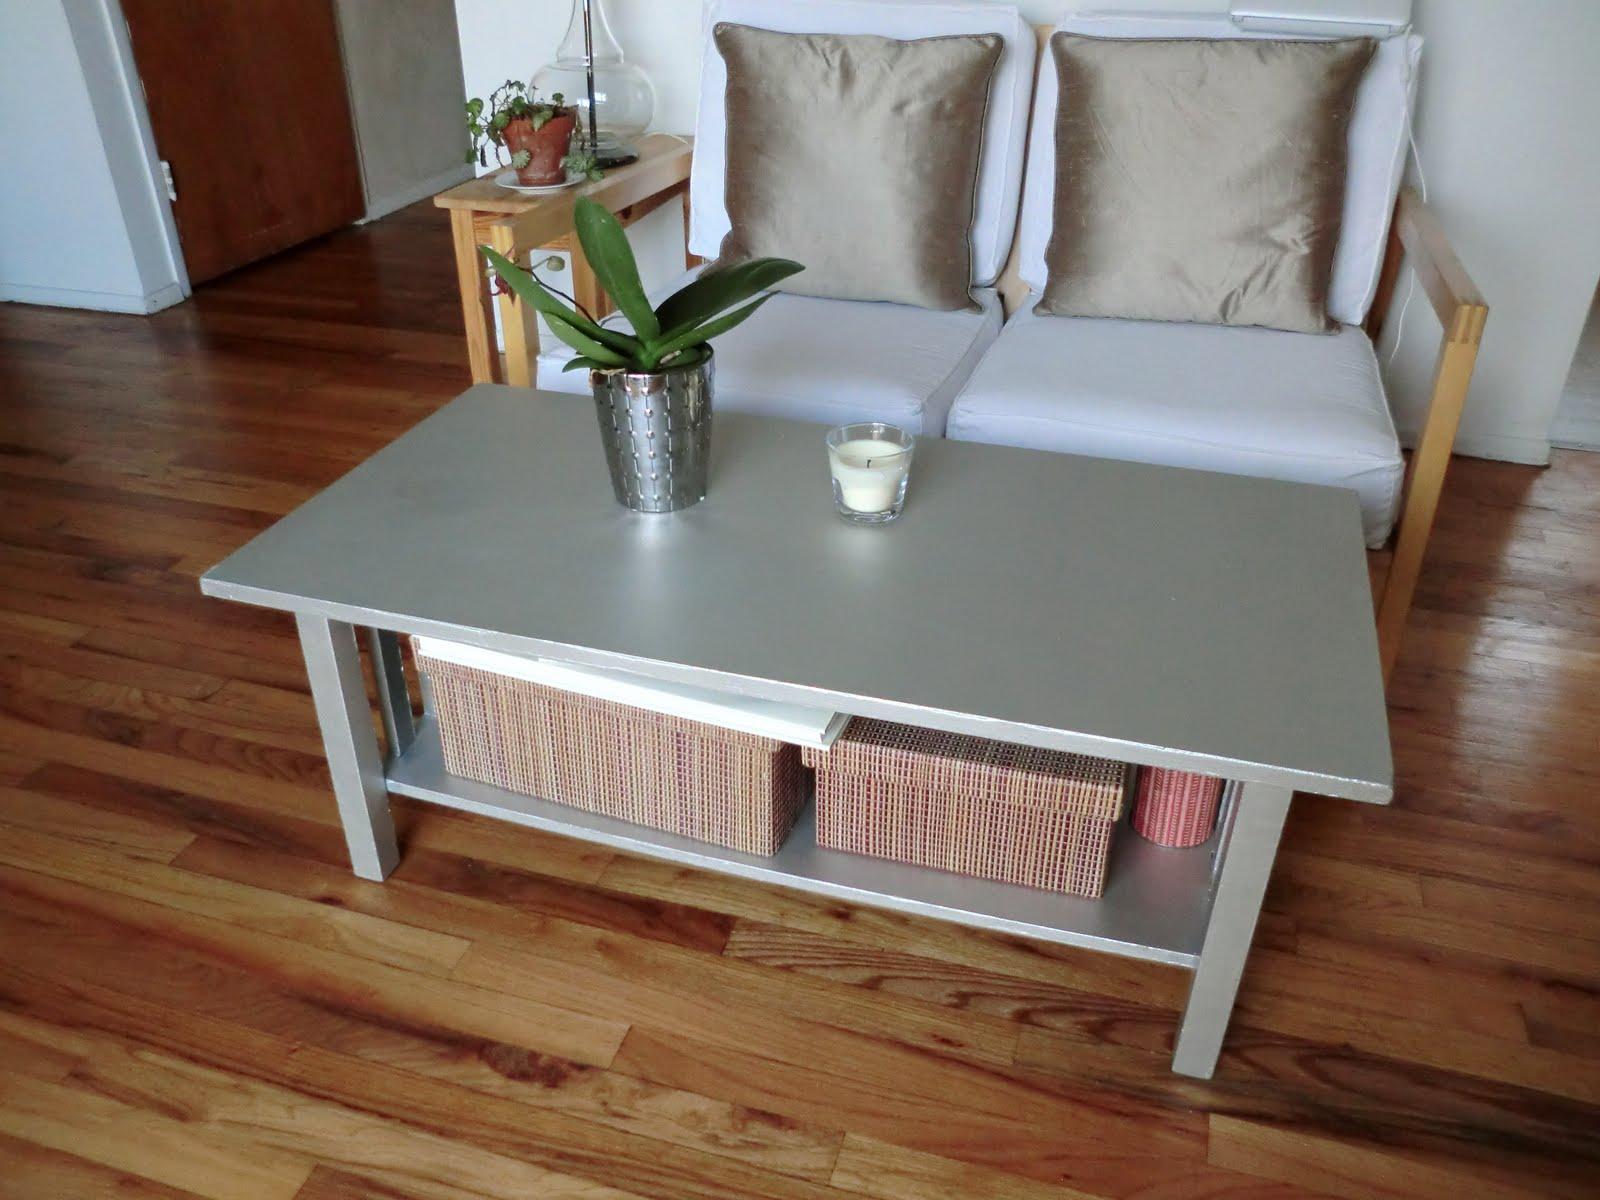 According to Lia: DIY Coffee Table Upgrade